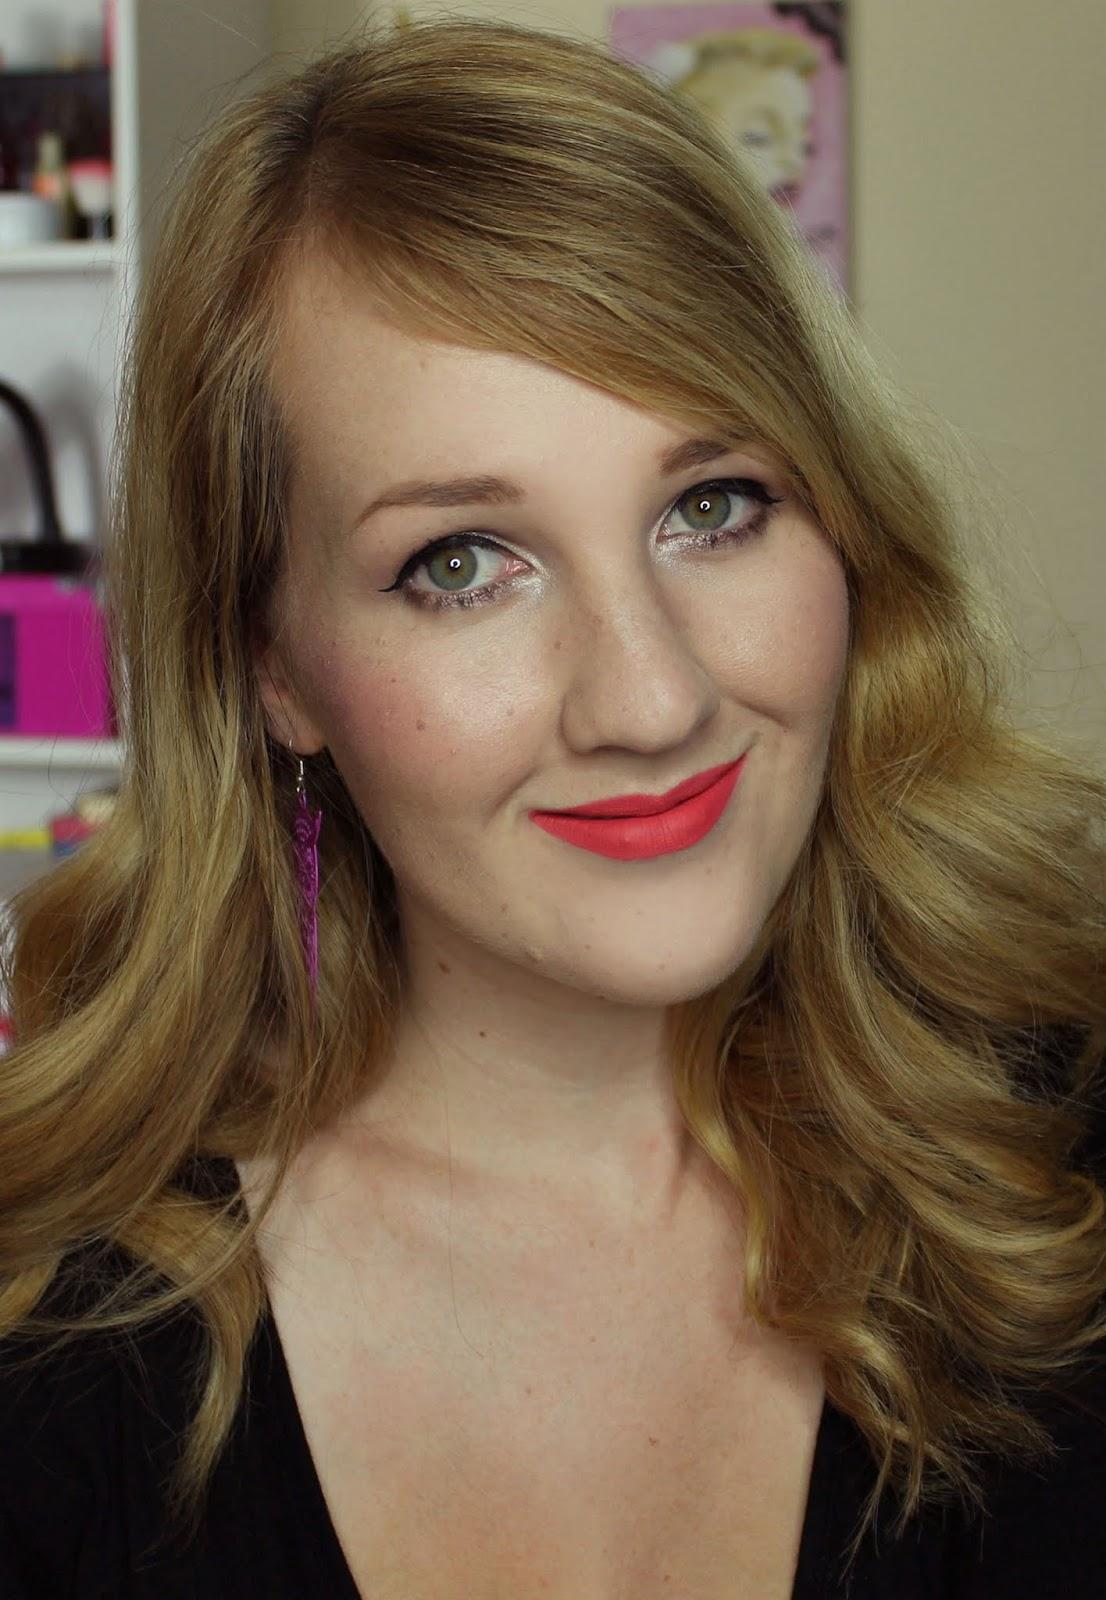 Australis Velourlips Matte Lip Cream - MI-A-MEE Swatches & Review